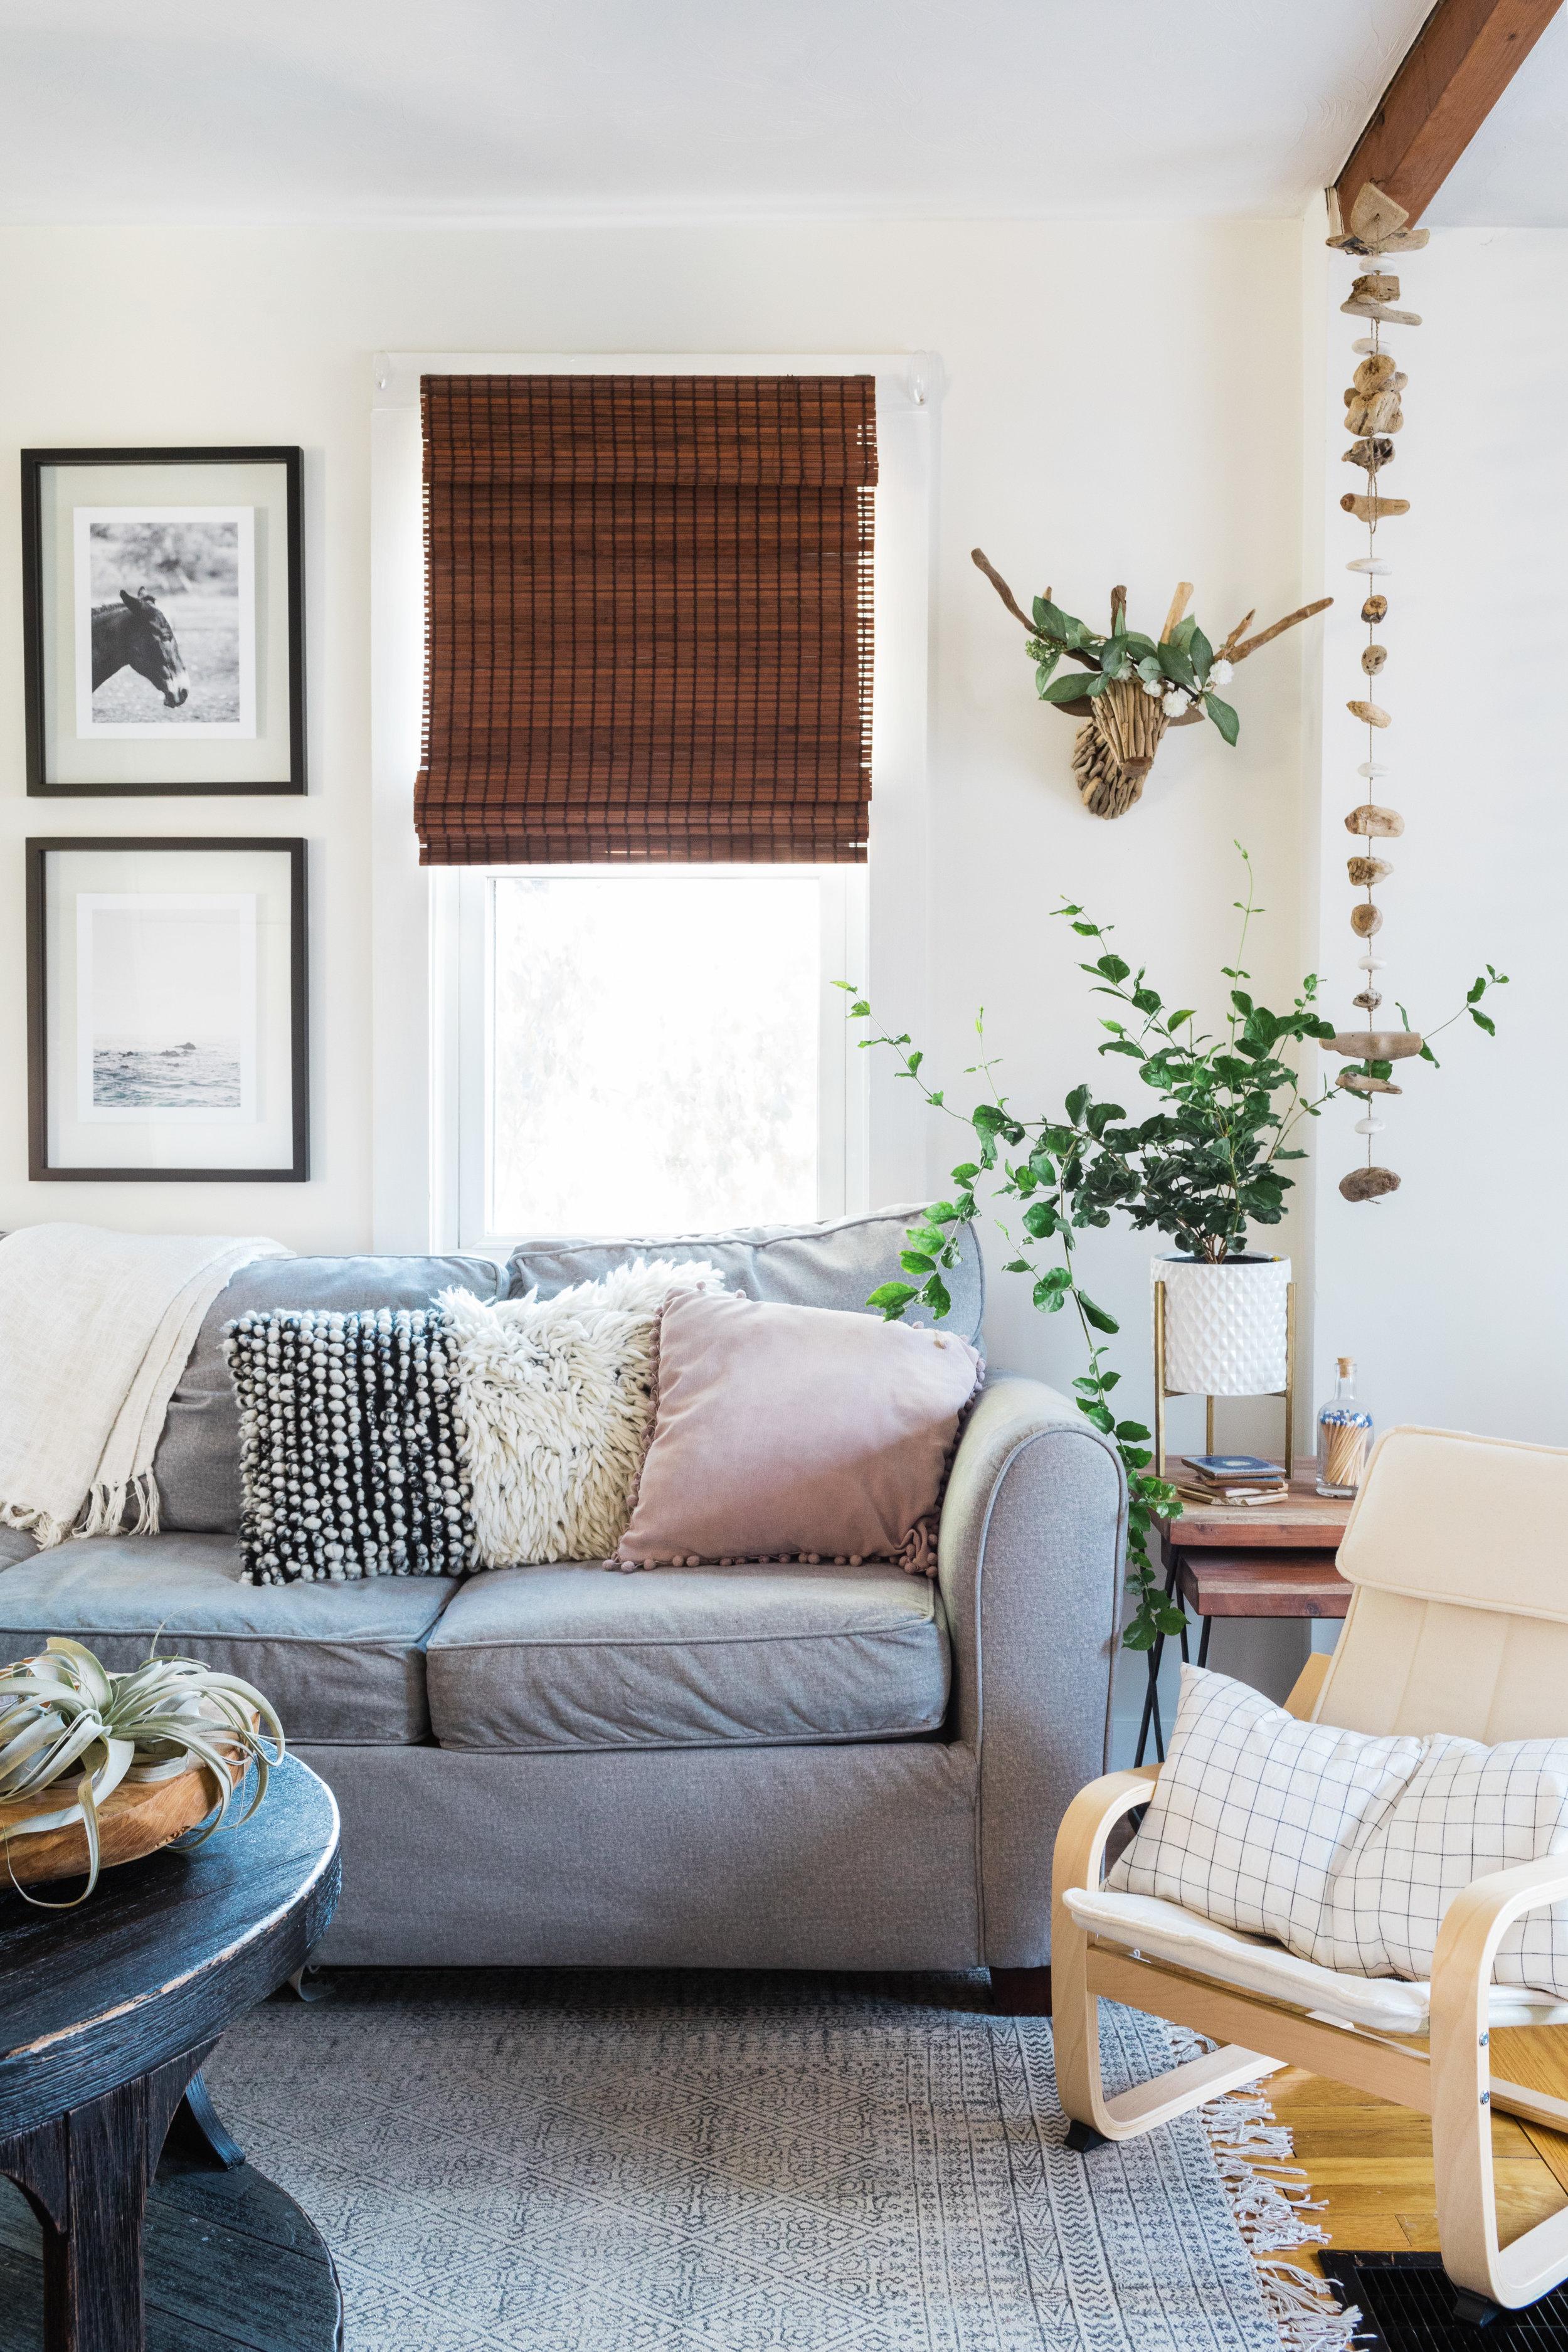 coffee table  /  children's chair  /  windowpane pillow  /  rug  / driftwood stag { similar } / driftwood garland { similar }